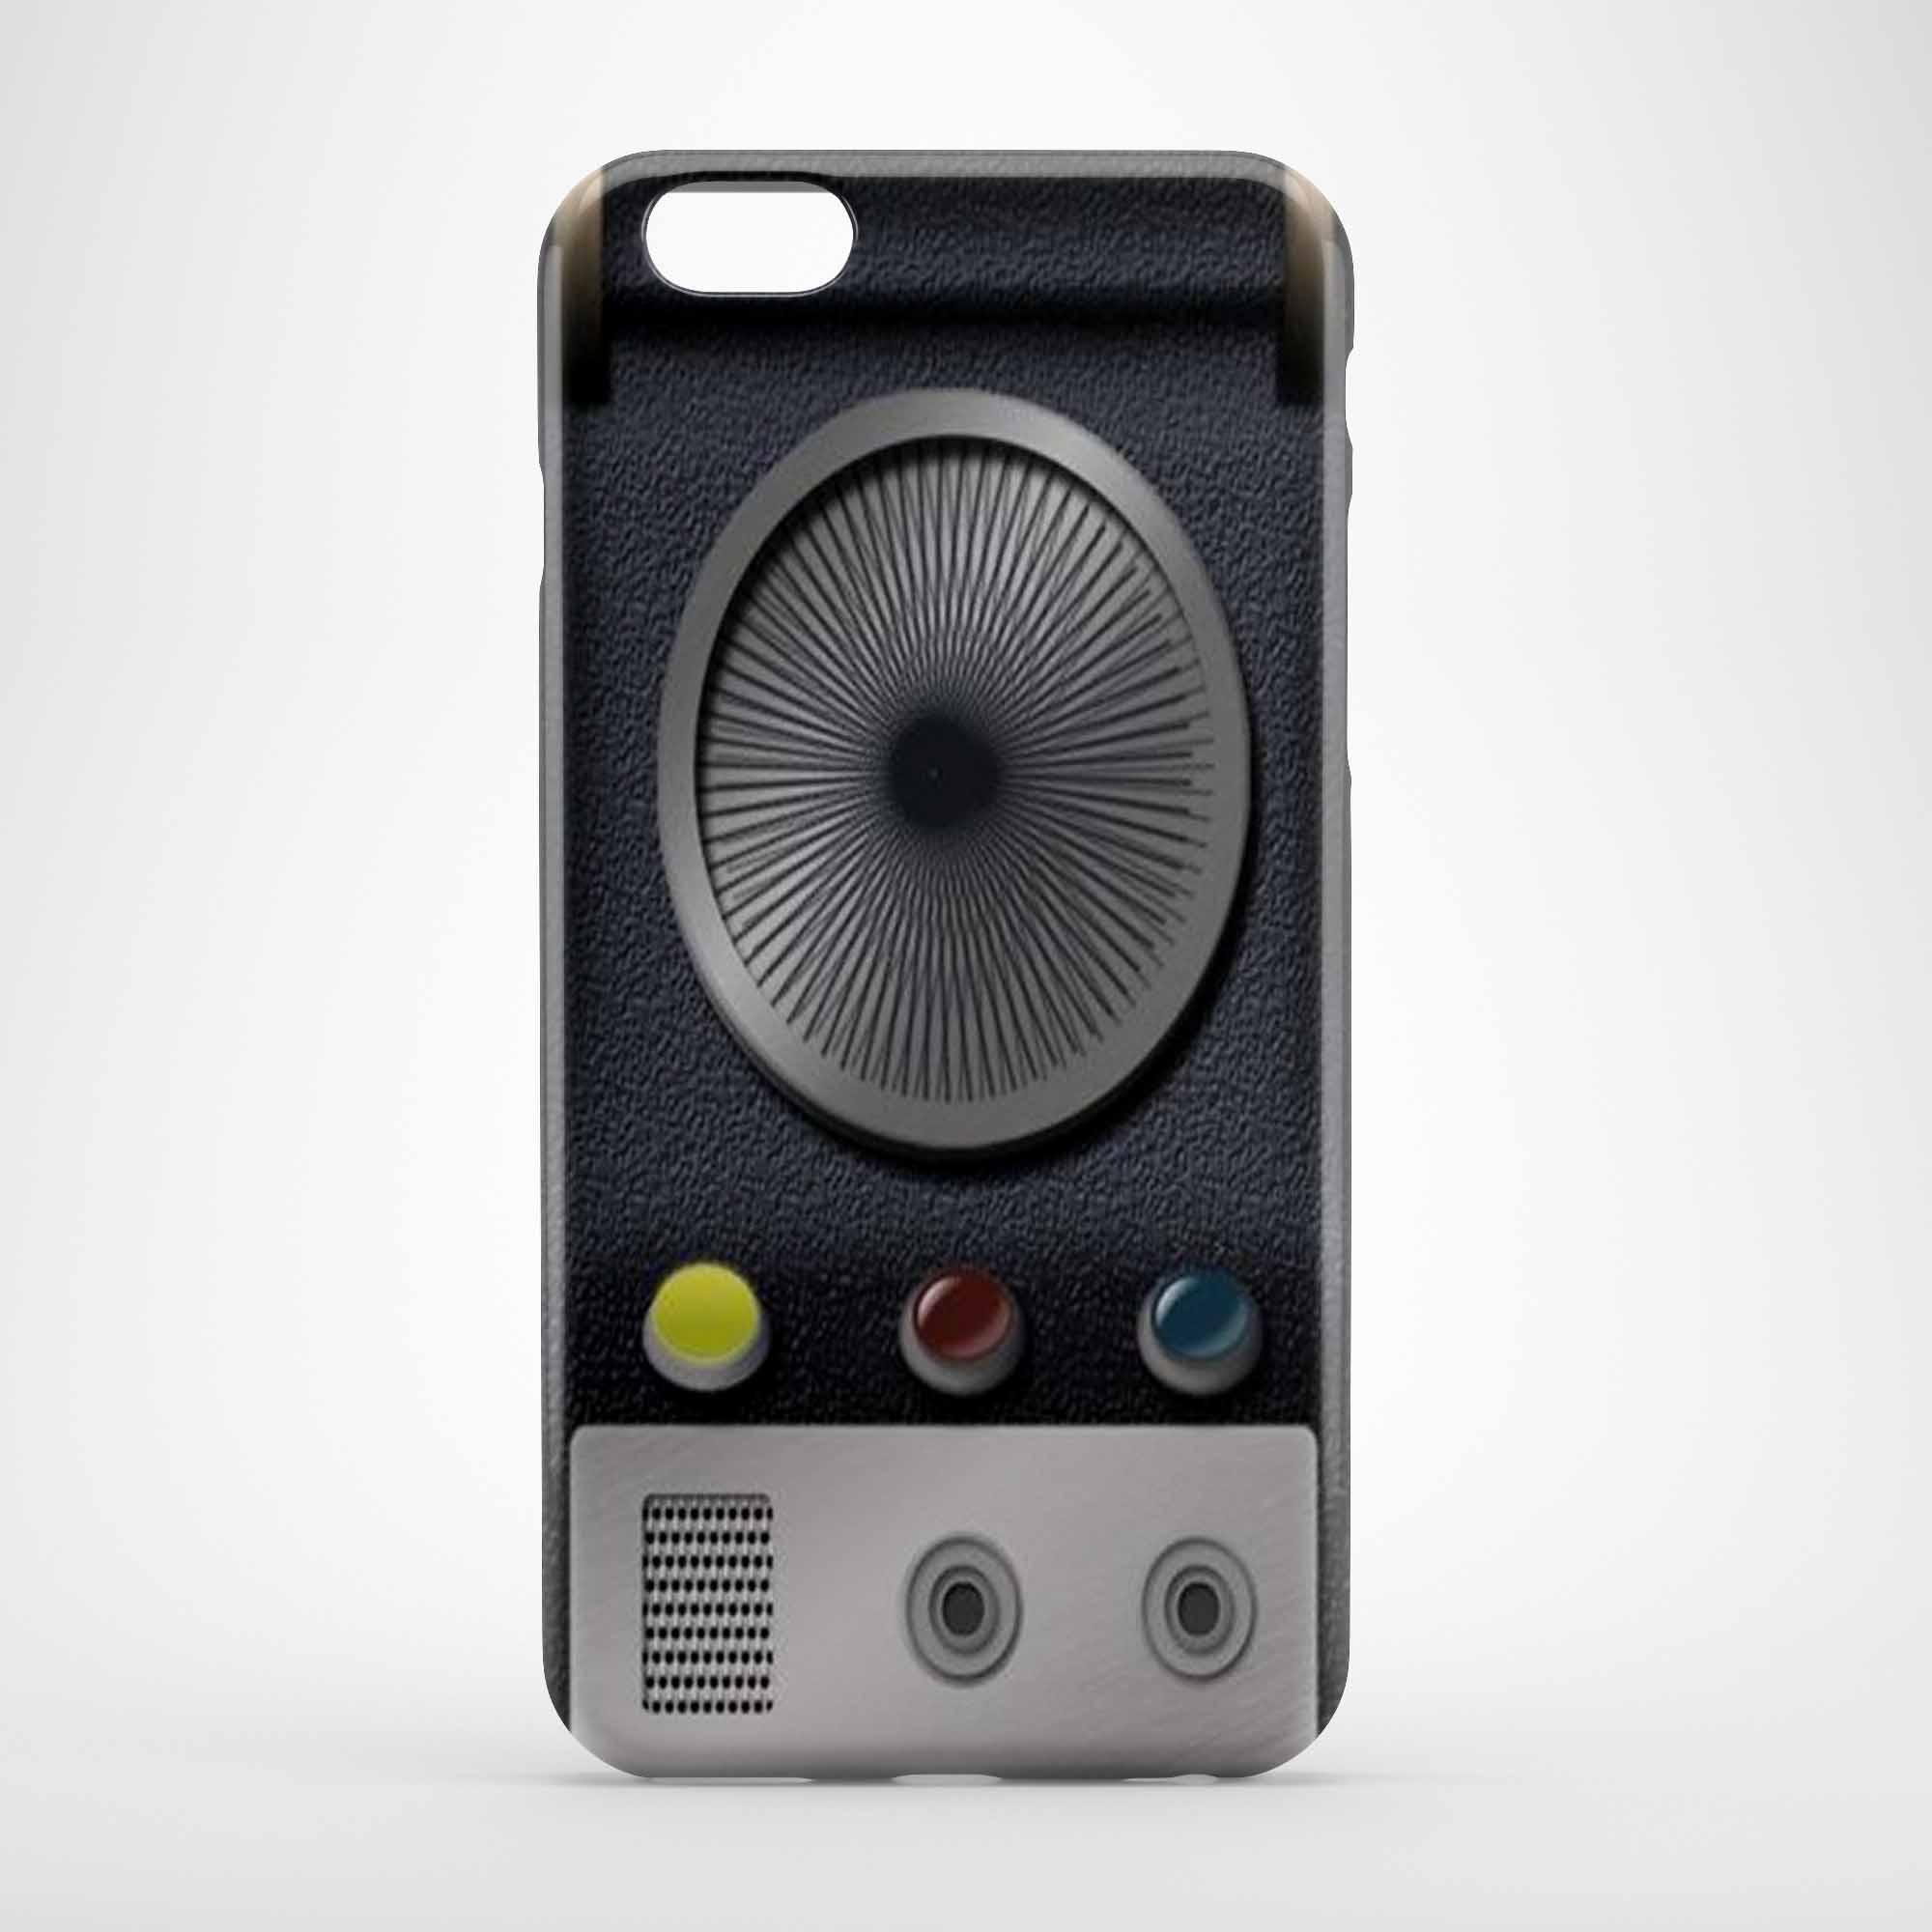 Jual communicator-app star trek Hard case Iphone case dan